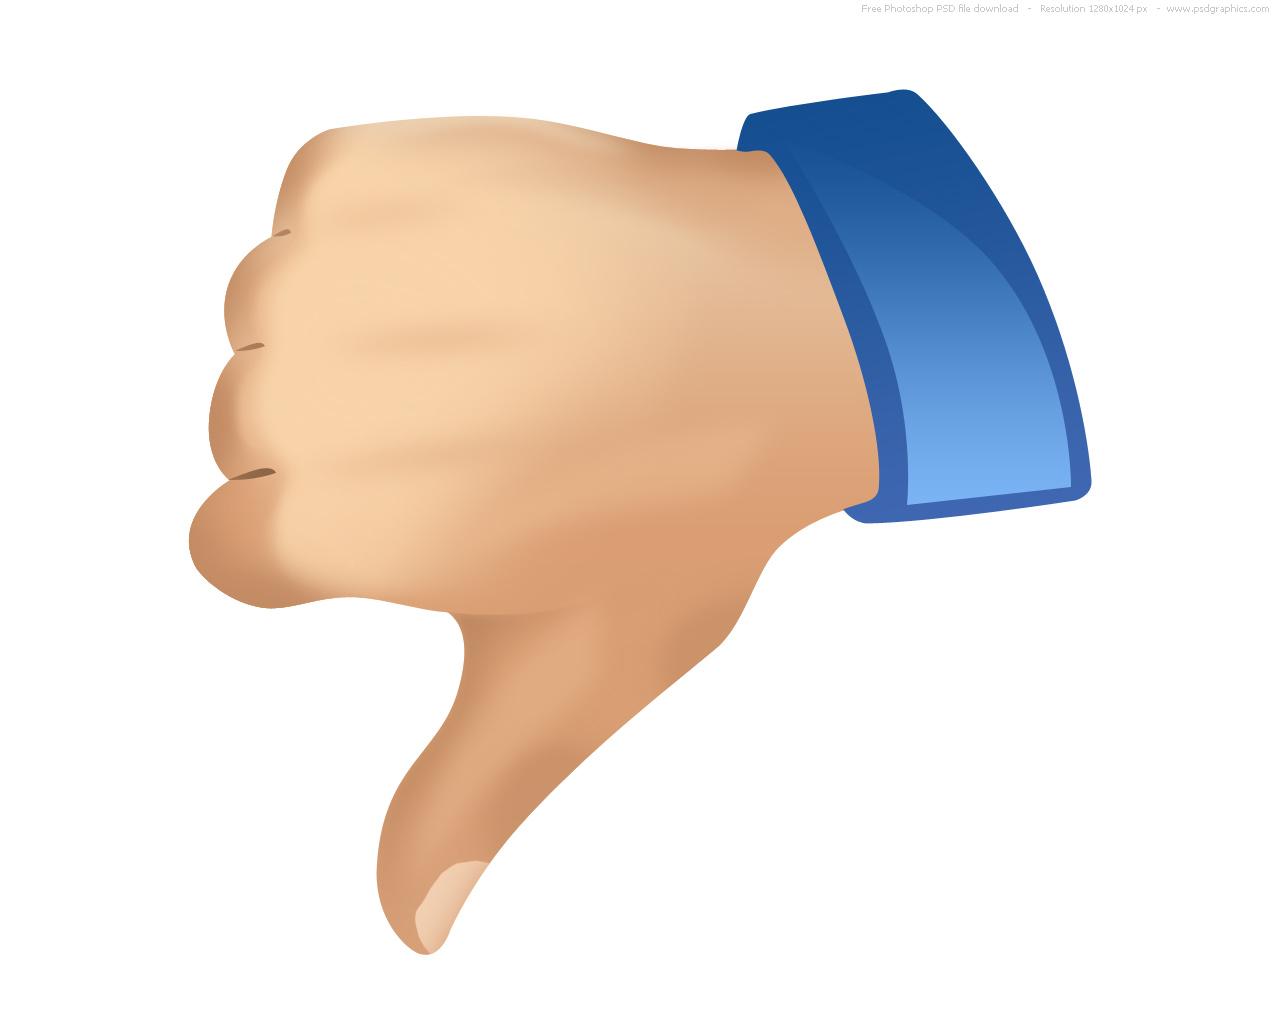 Thumbs Down Image.